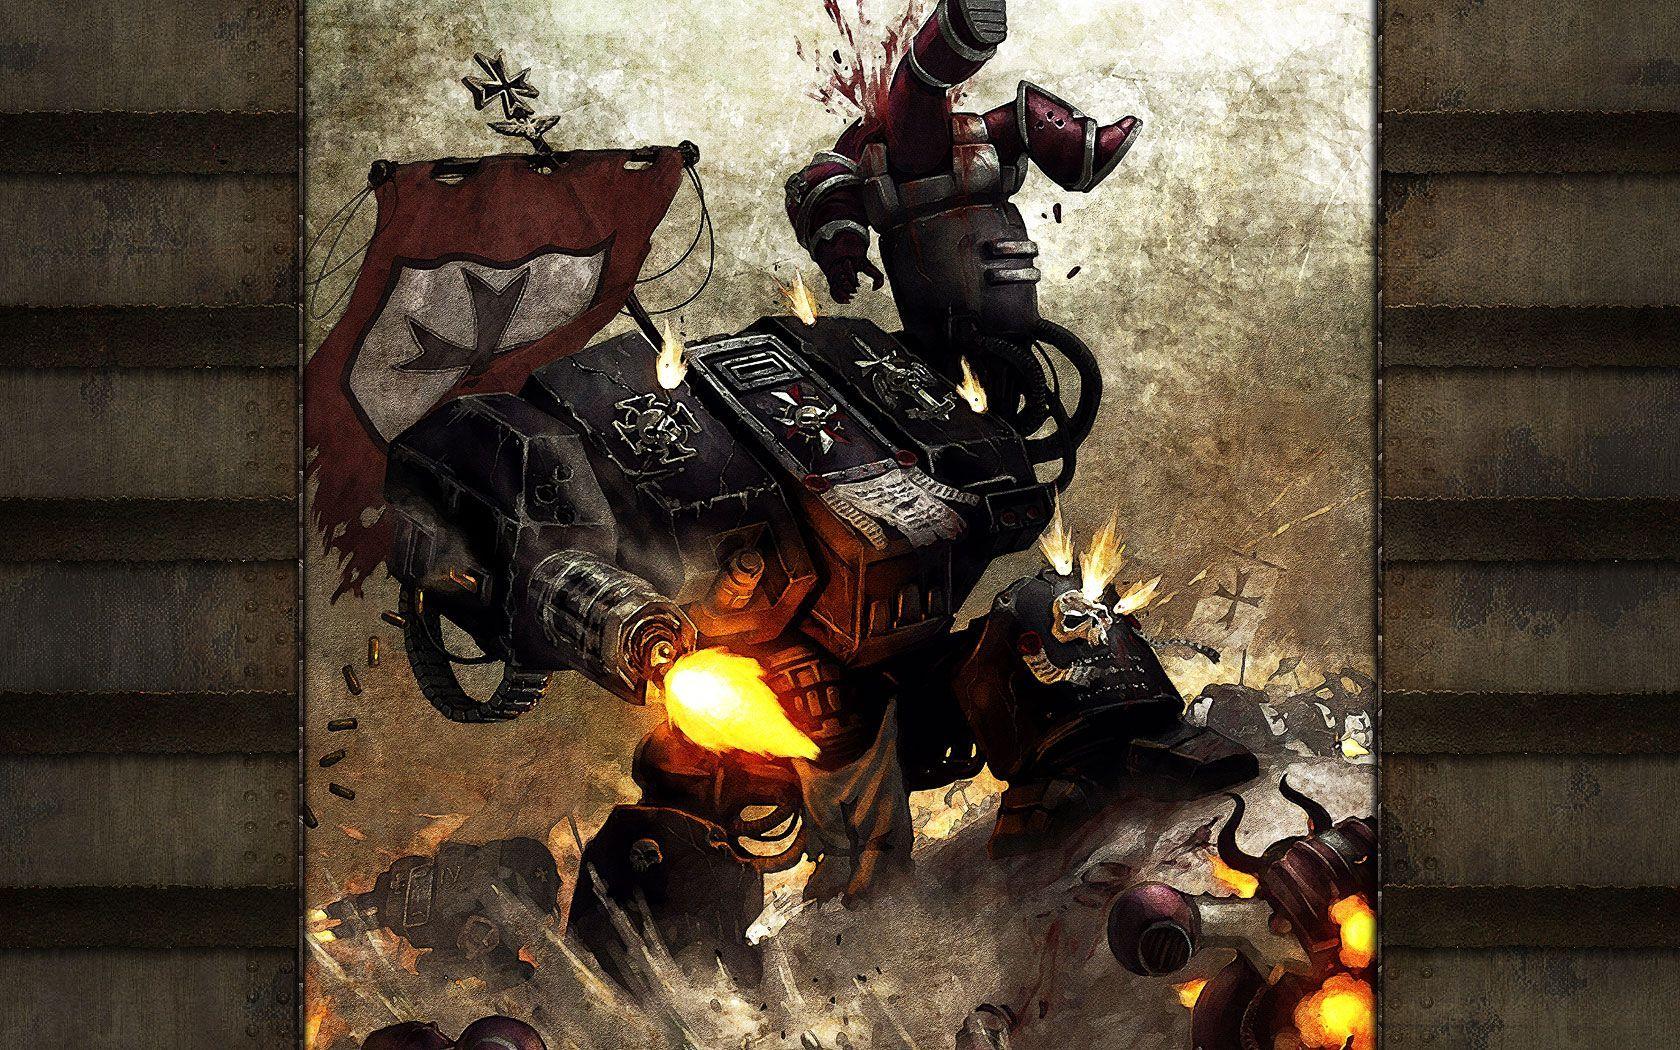 Black Templars Wallpaper Google Search Warhammer Art